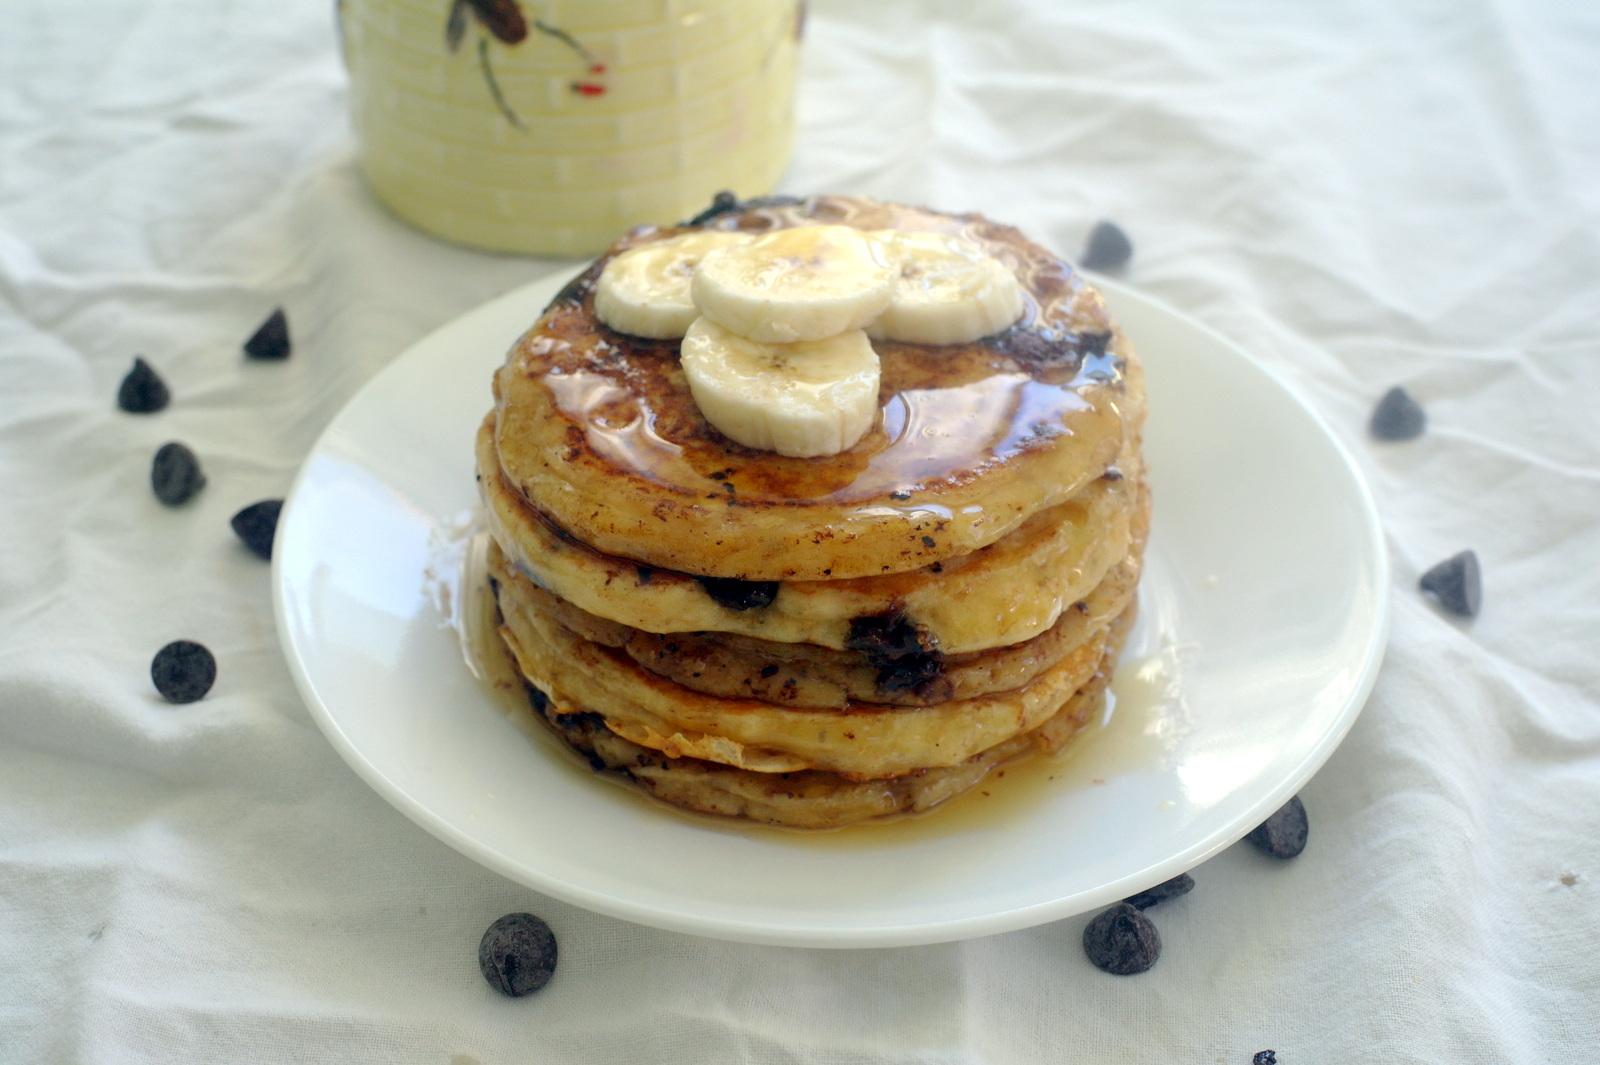 Around le globe: Banana chocolate chip pancakes